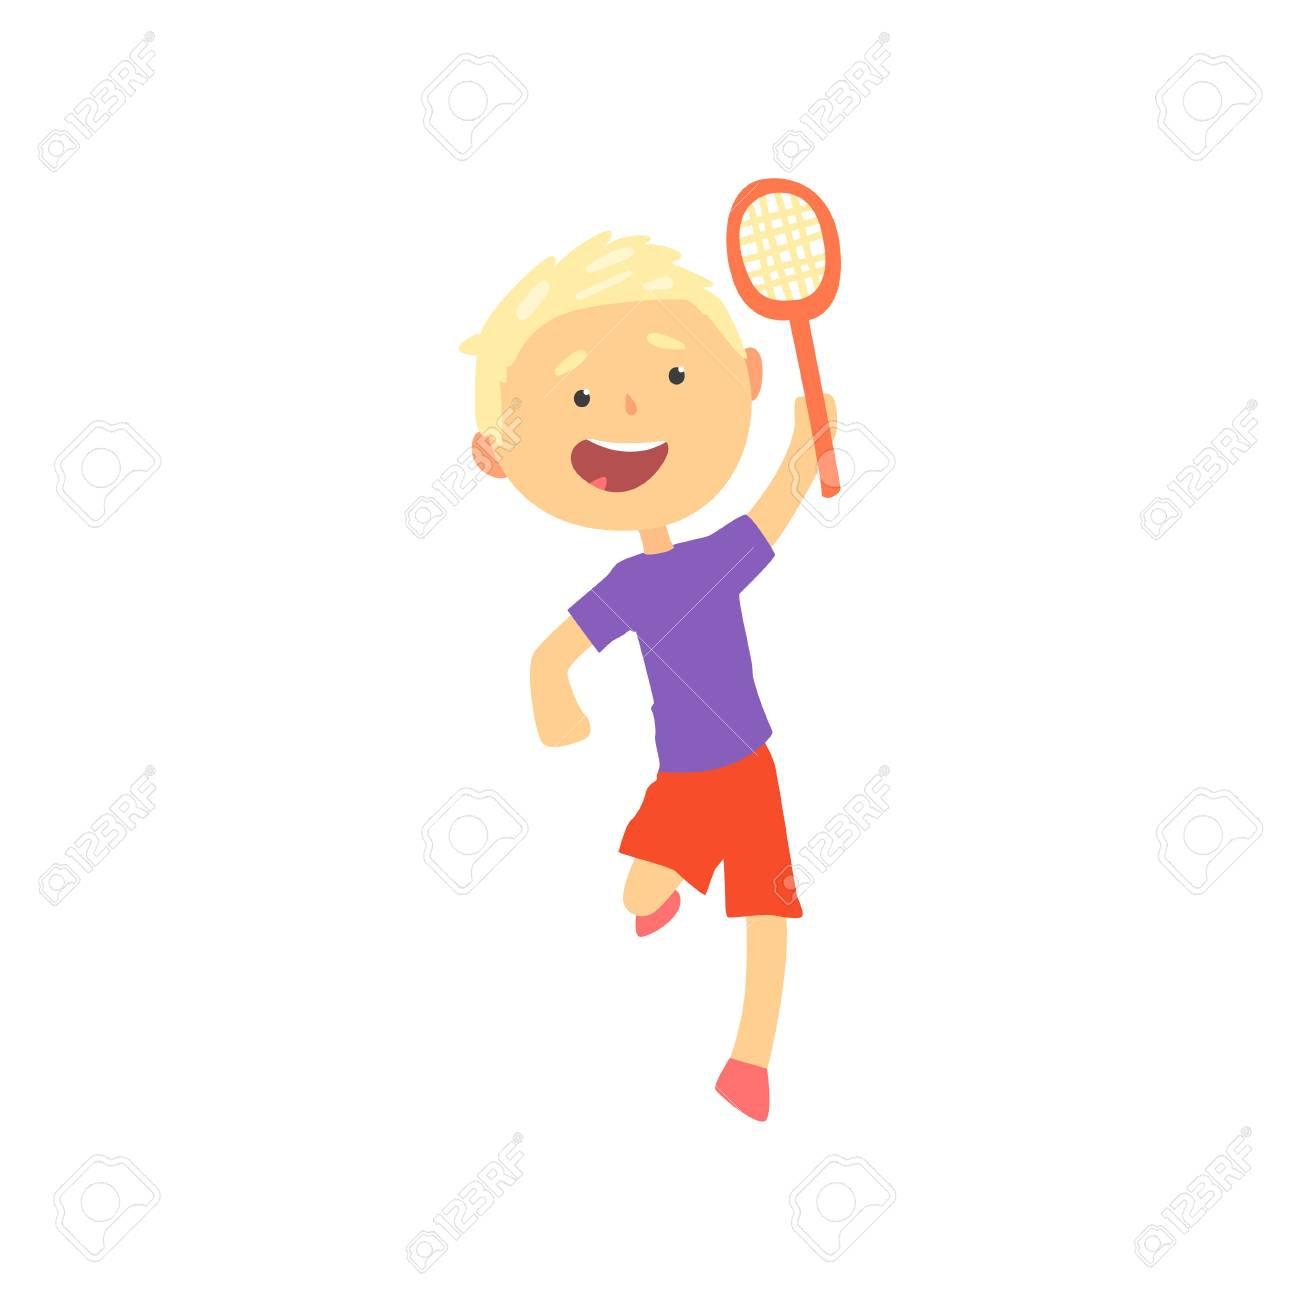 Semaine 09-08 Badminton enfant